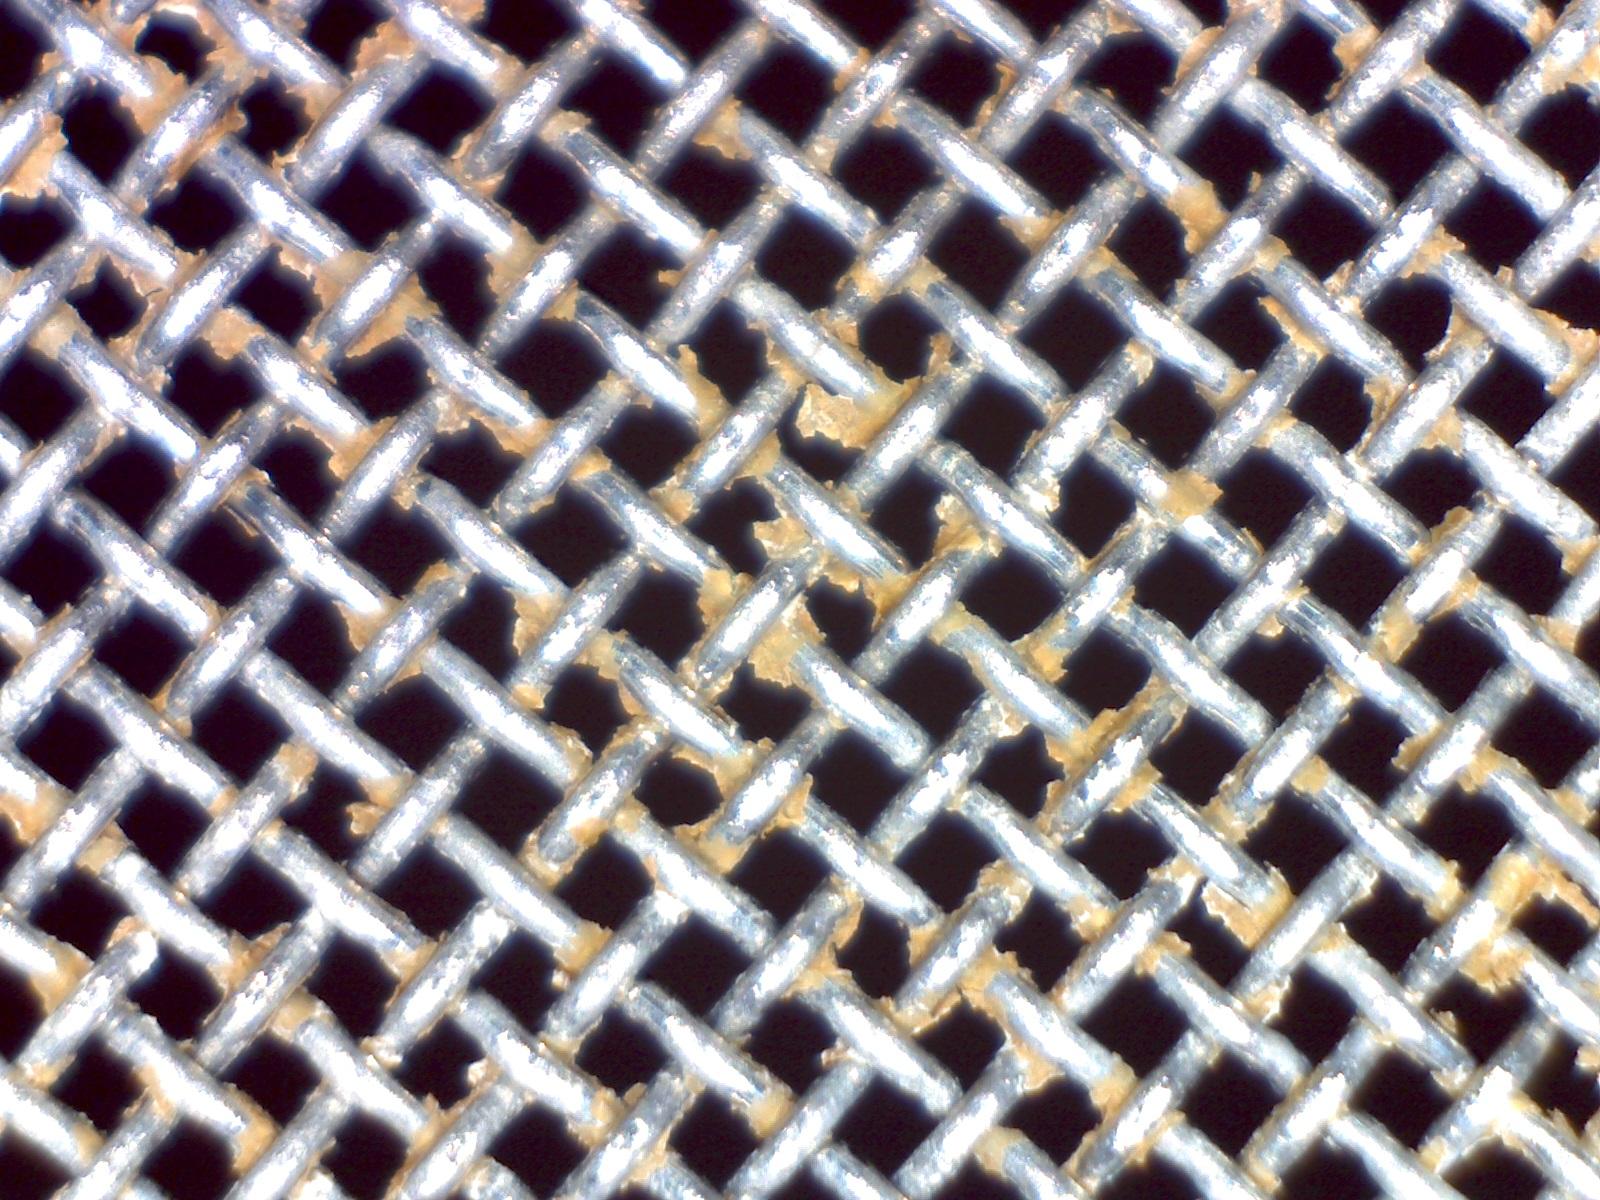 spider_cleaning_02.jpg